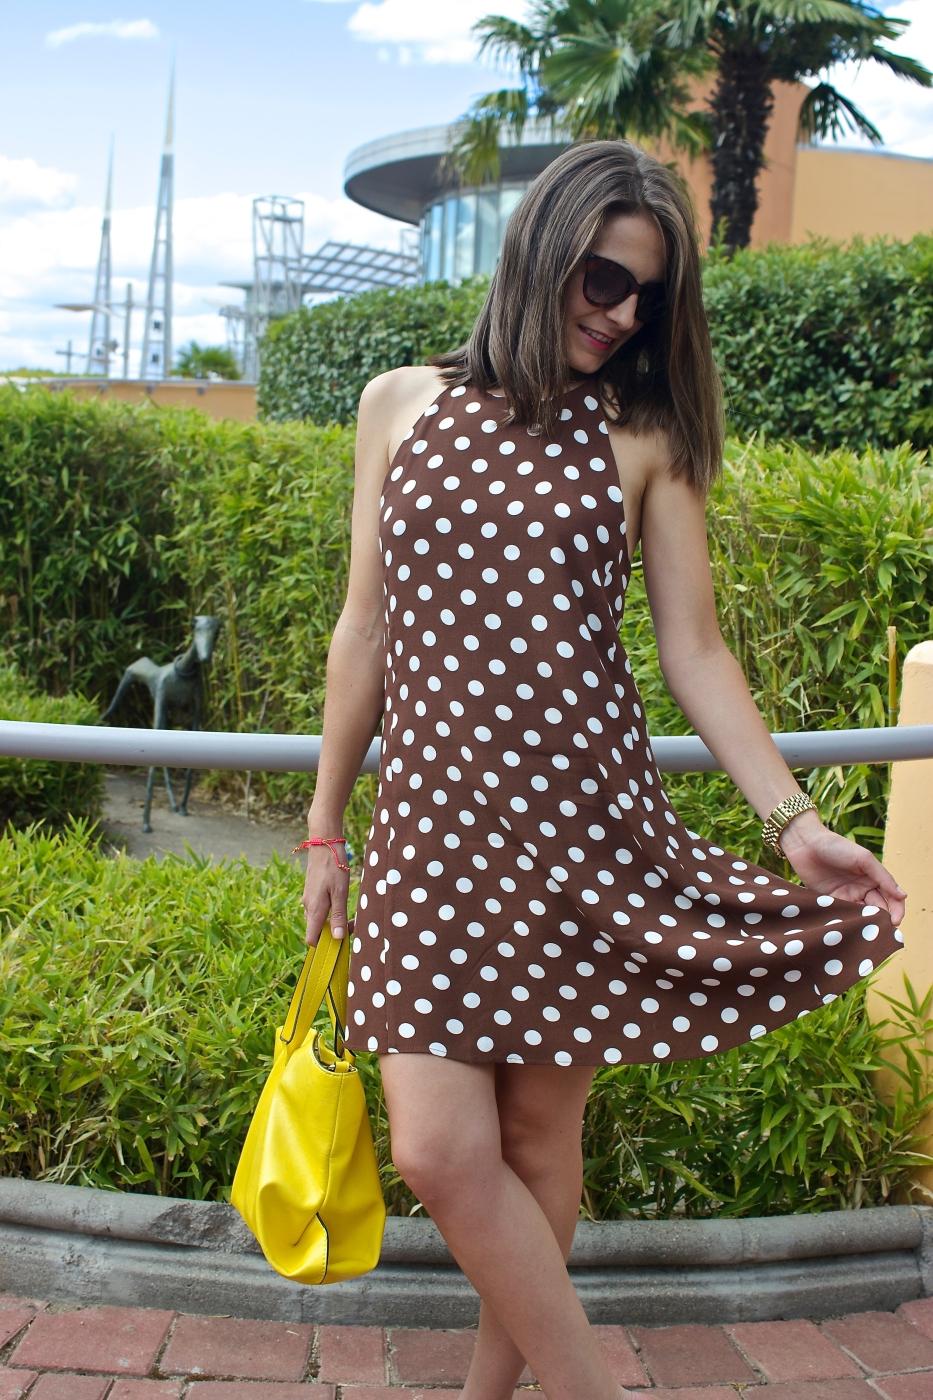 lara-vazquez-madlula-style-streetstyle-look-ootd-fashion-dots-dress